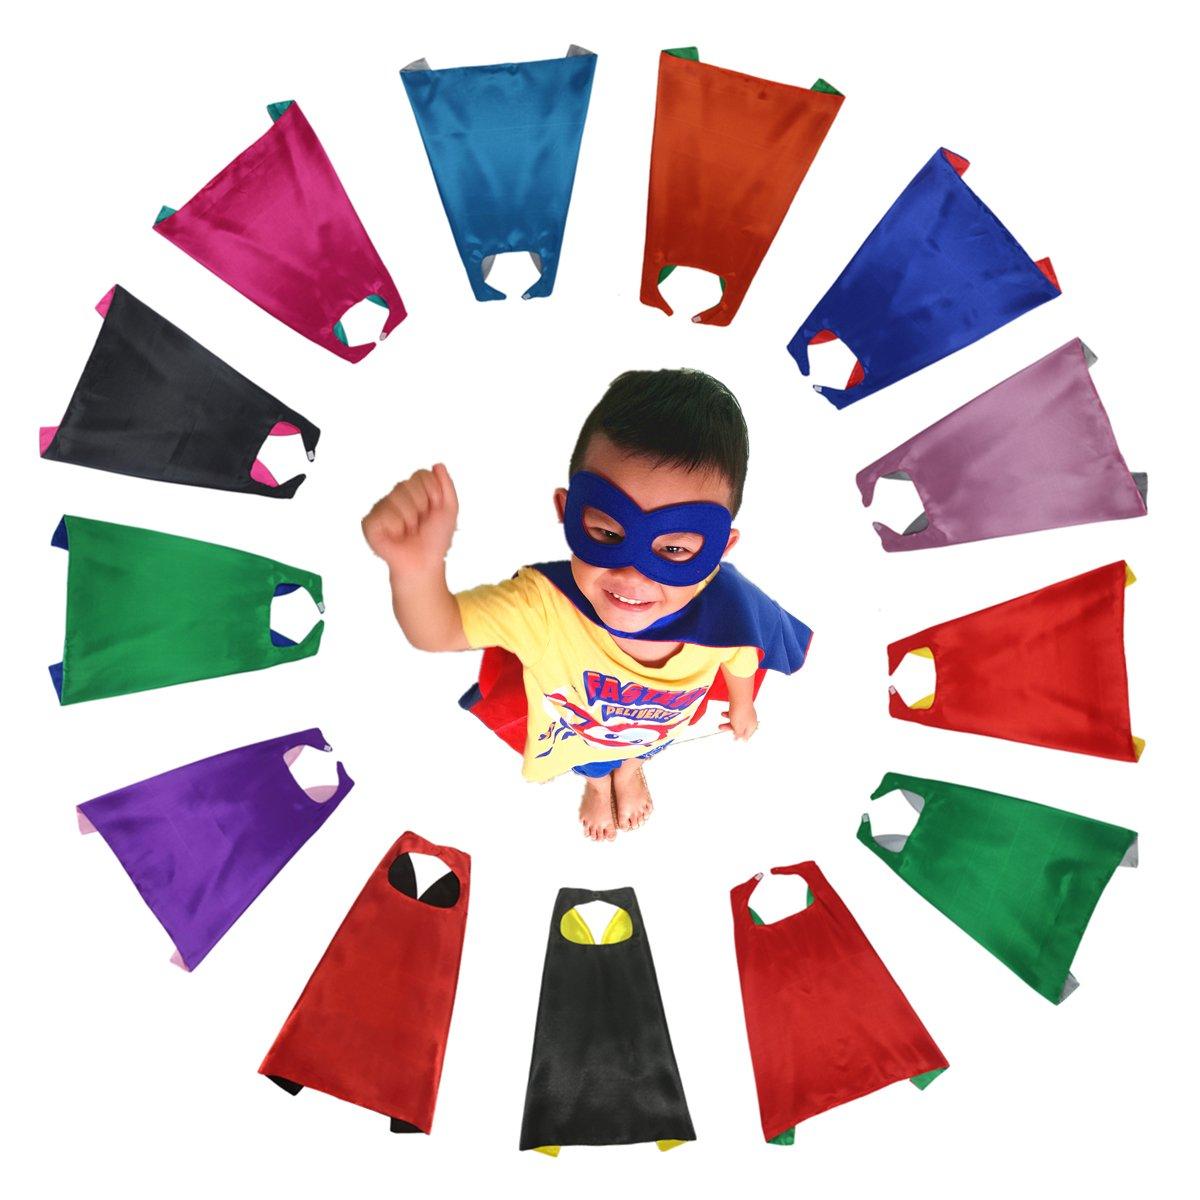 RANAVY Superhero Capes and Masks Bulk Set Dress up for Kids - Children DIY Birthday Party Costumes (13 PCS(27''x27''))